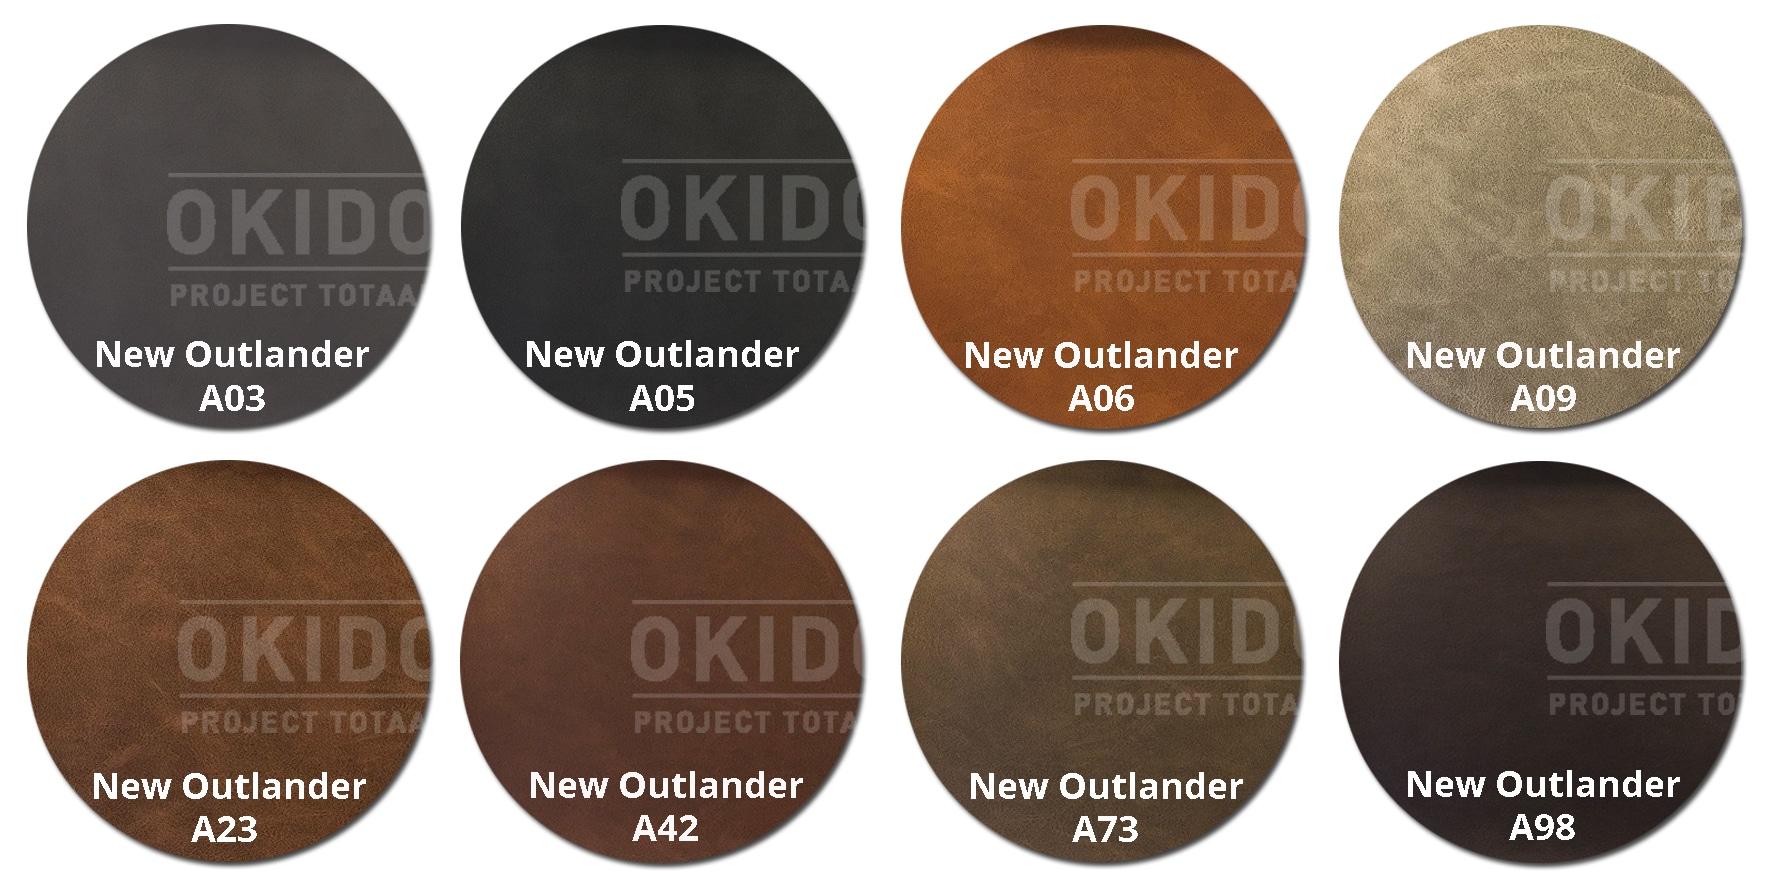 New Outlander kleurrondjes met logo 1 - Barkruk Cesar A23